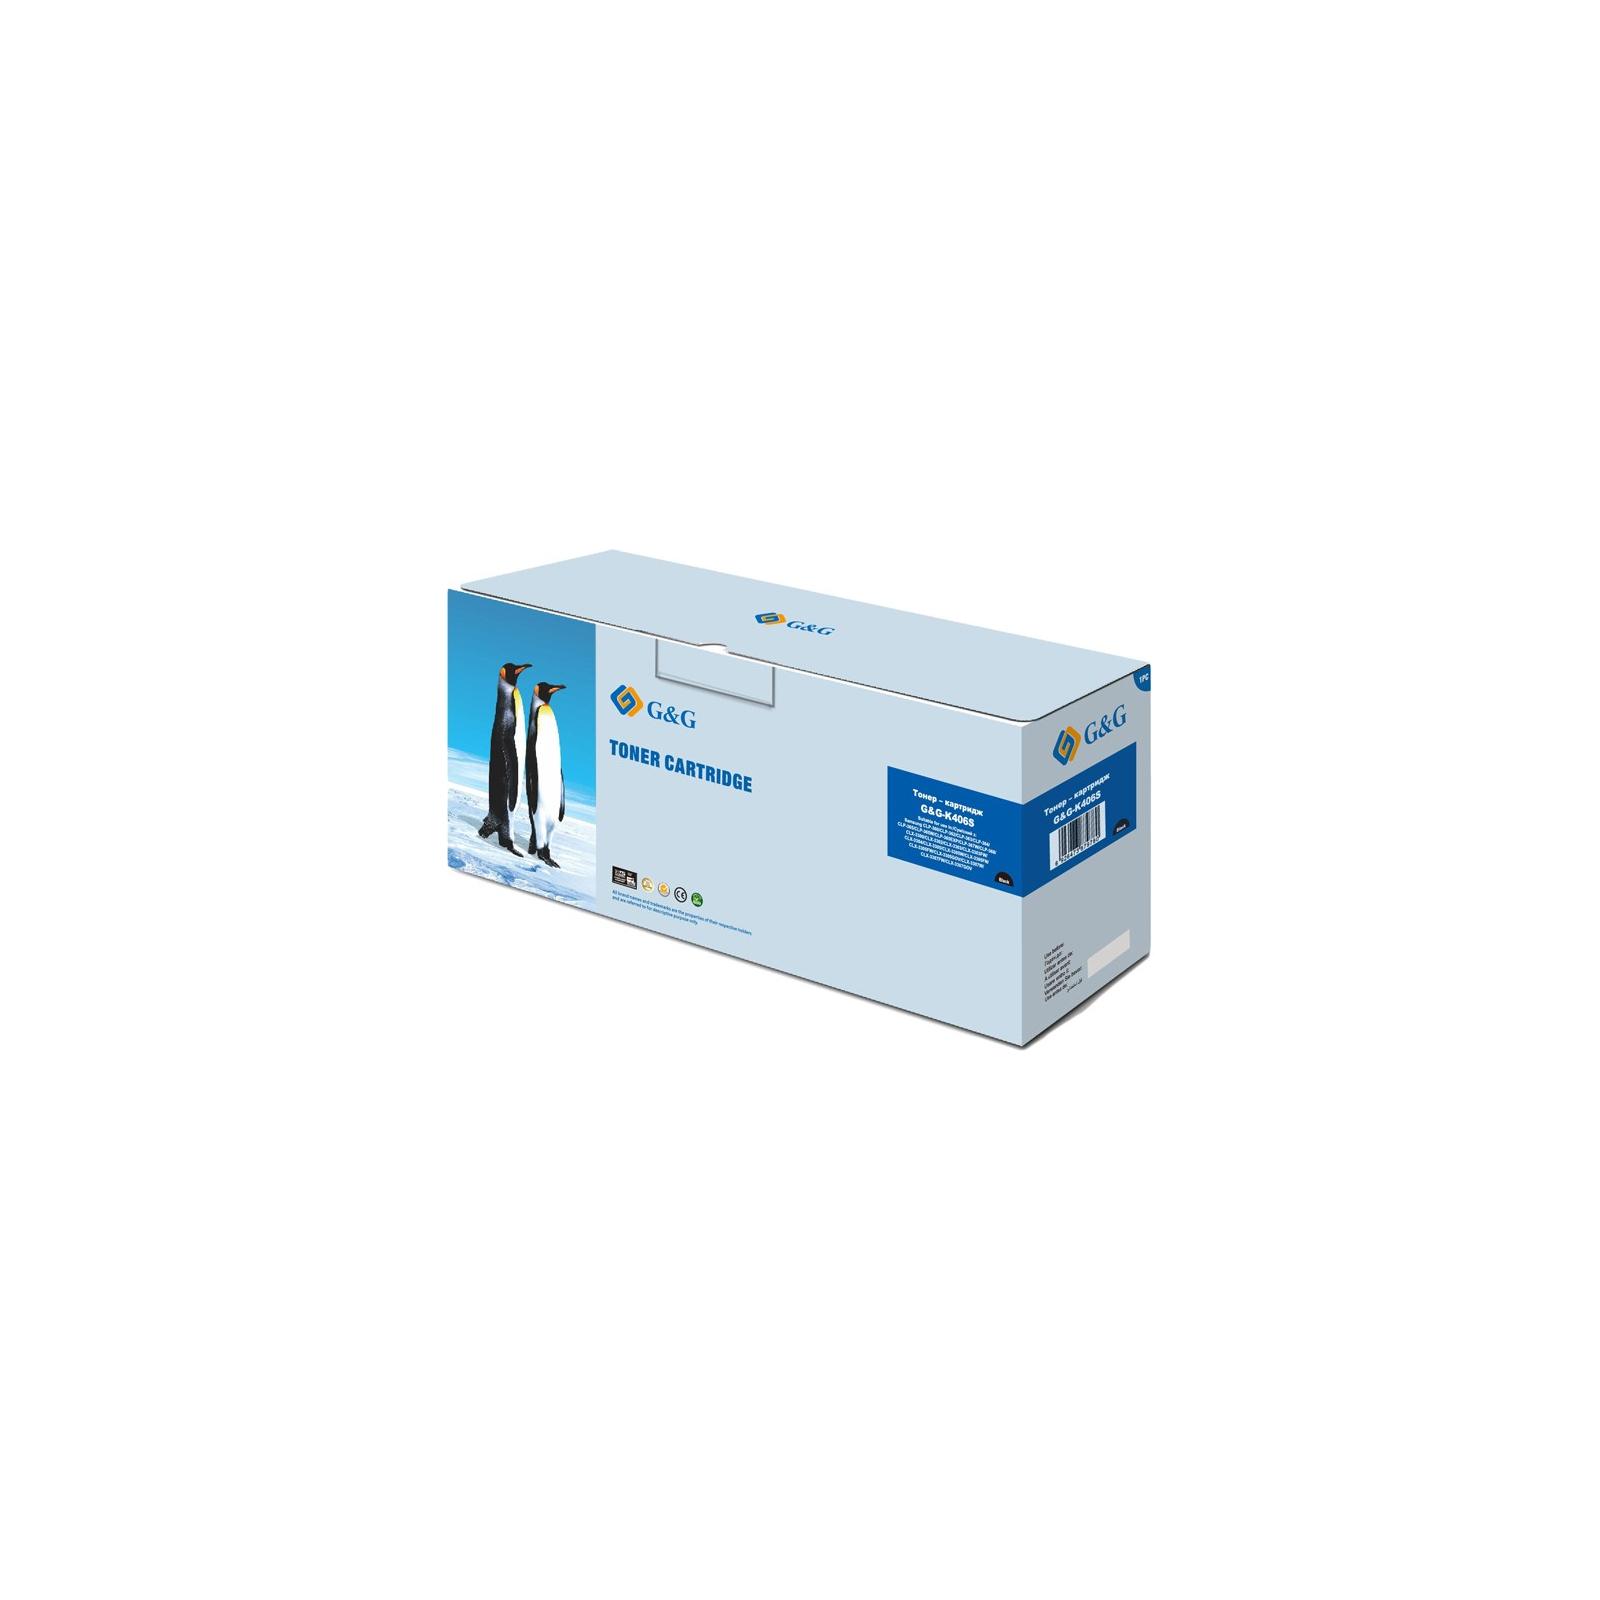 Картридж G&G для Samsung CLP-365/SL-C460W/ CLX-3305/3305FN Black (G&G-K406S)